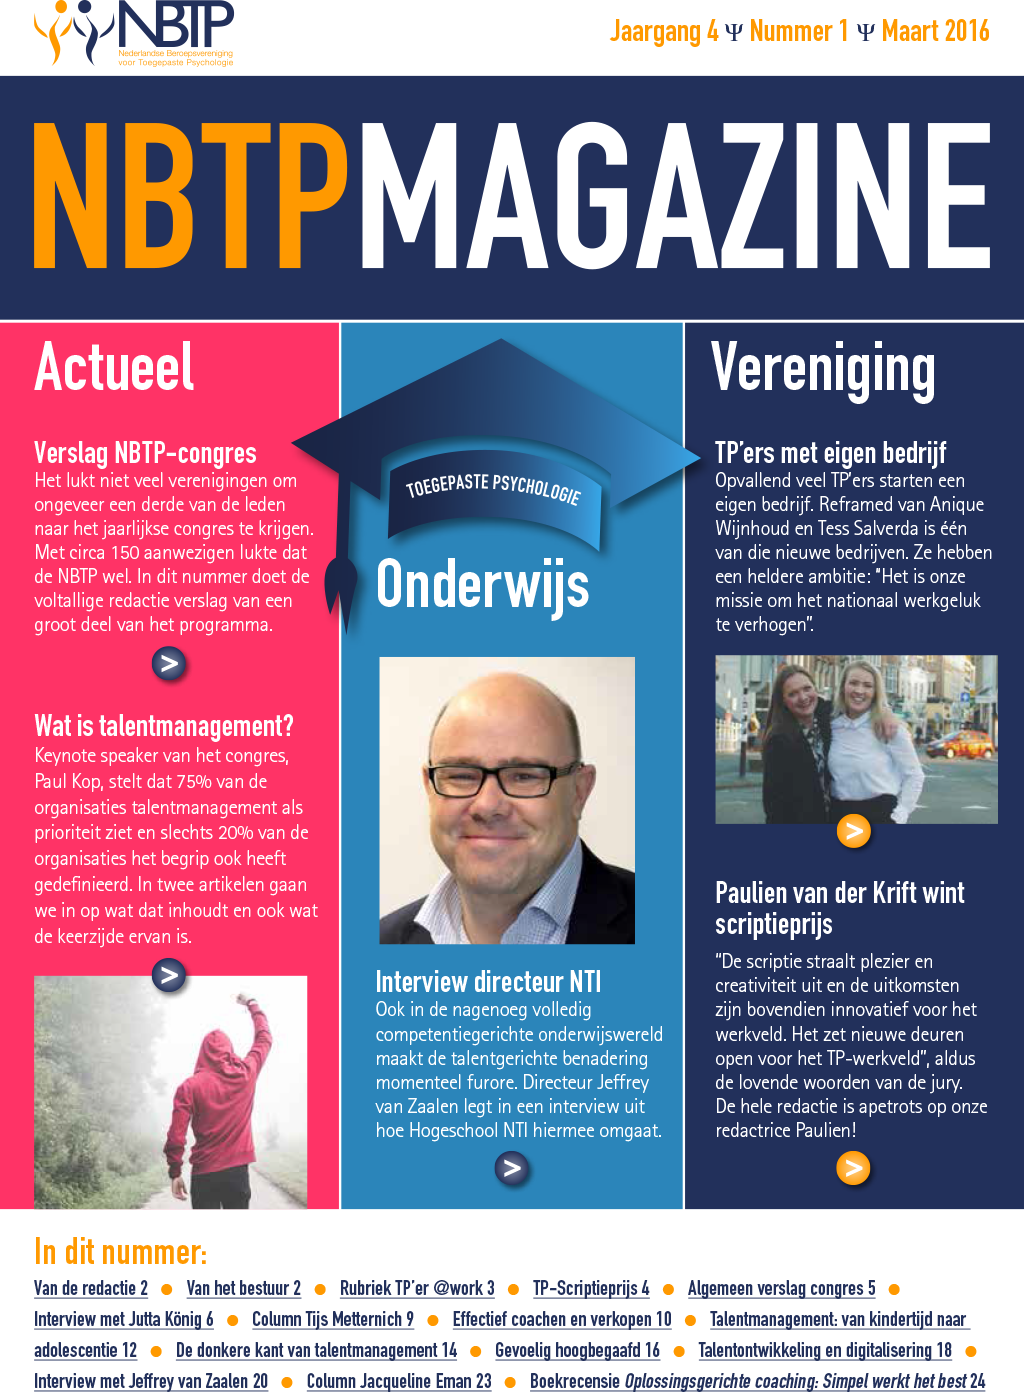 Nieuw NBTP Magazine